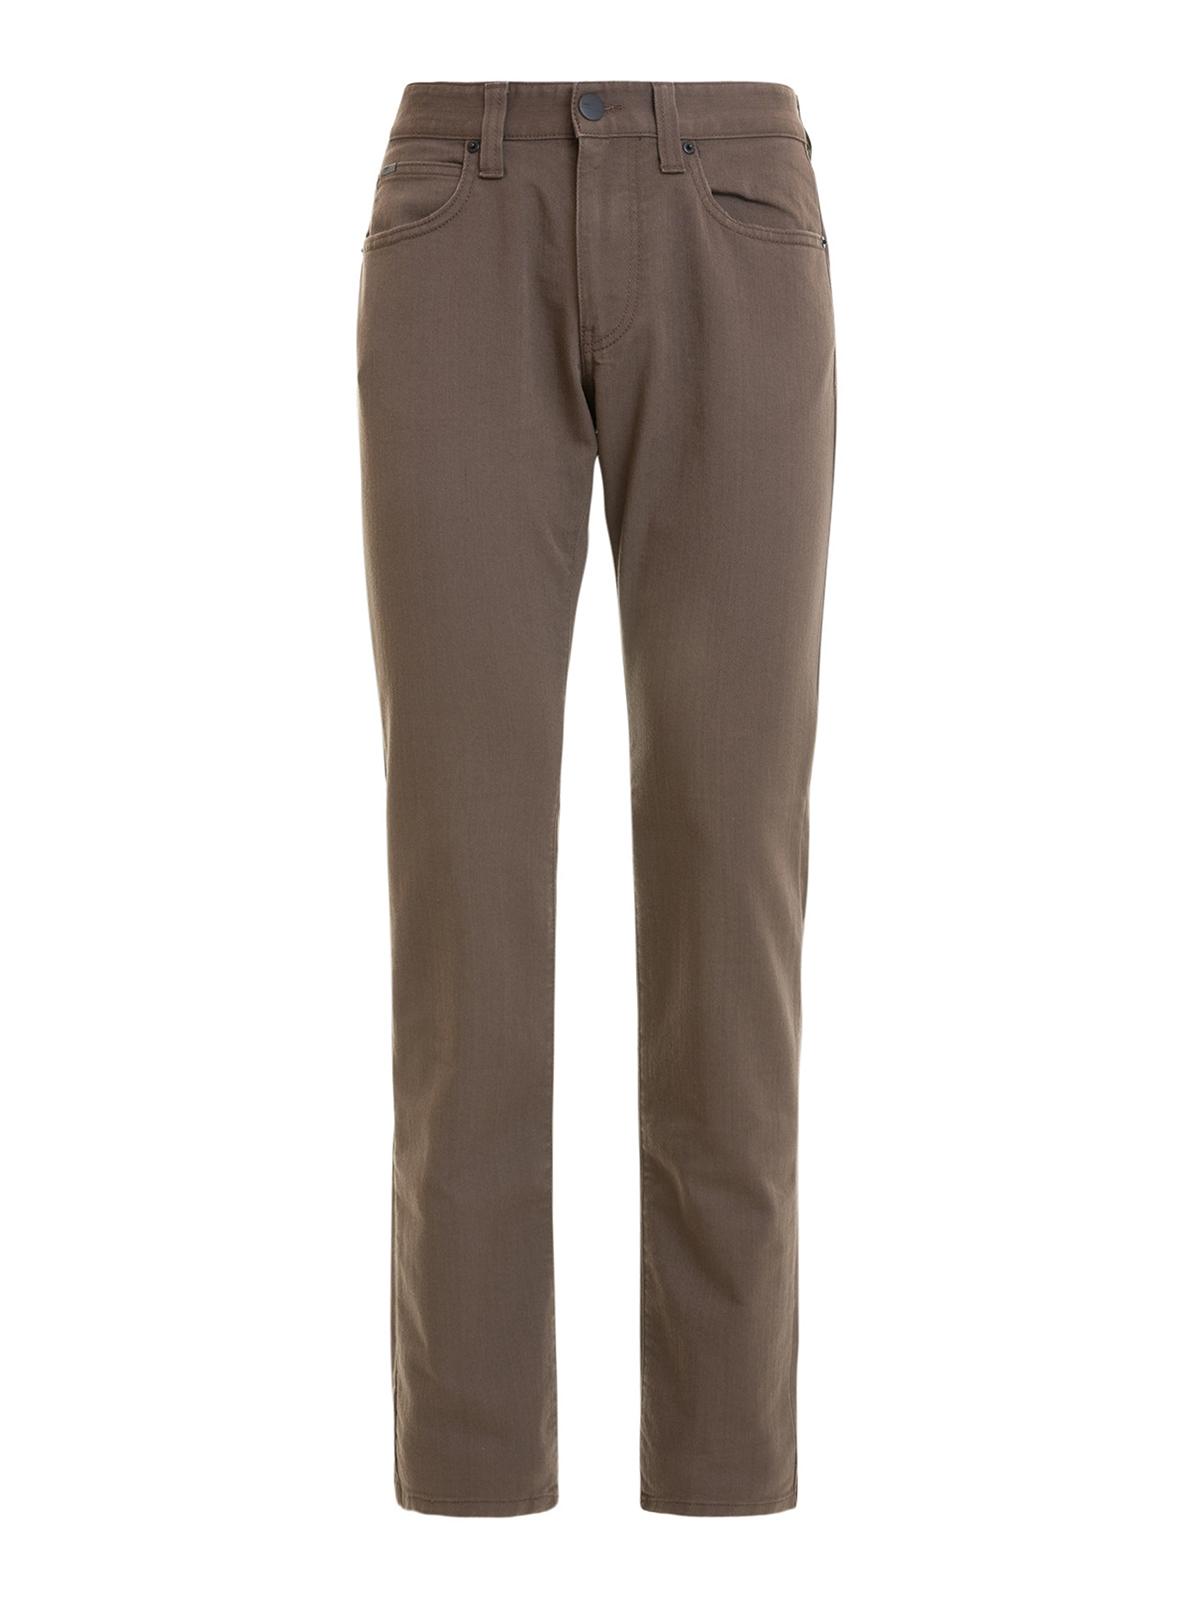 j06 low waist slim fit jeans by armani collezioni. Black Bedroom Furniture Sets. Home Design Ideas